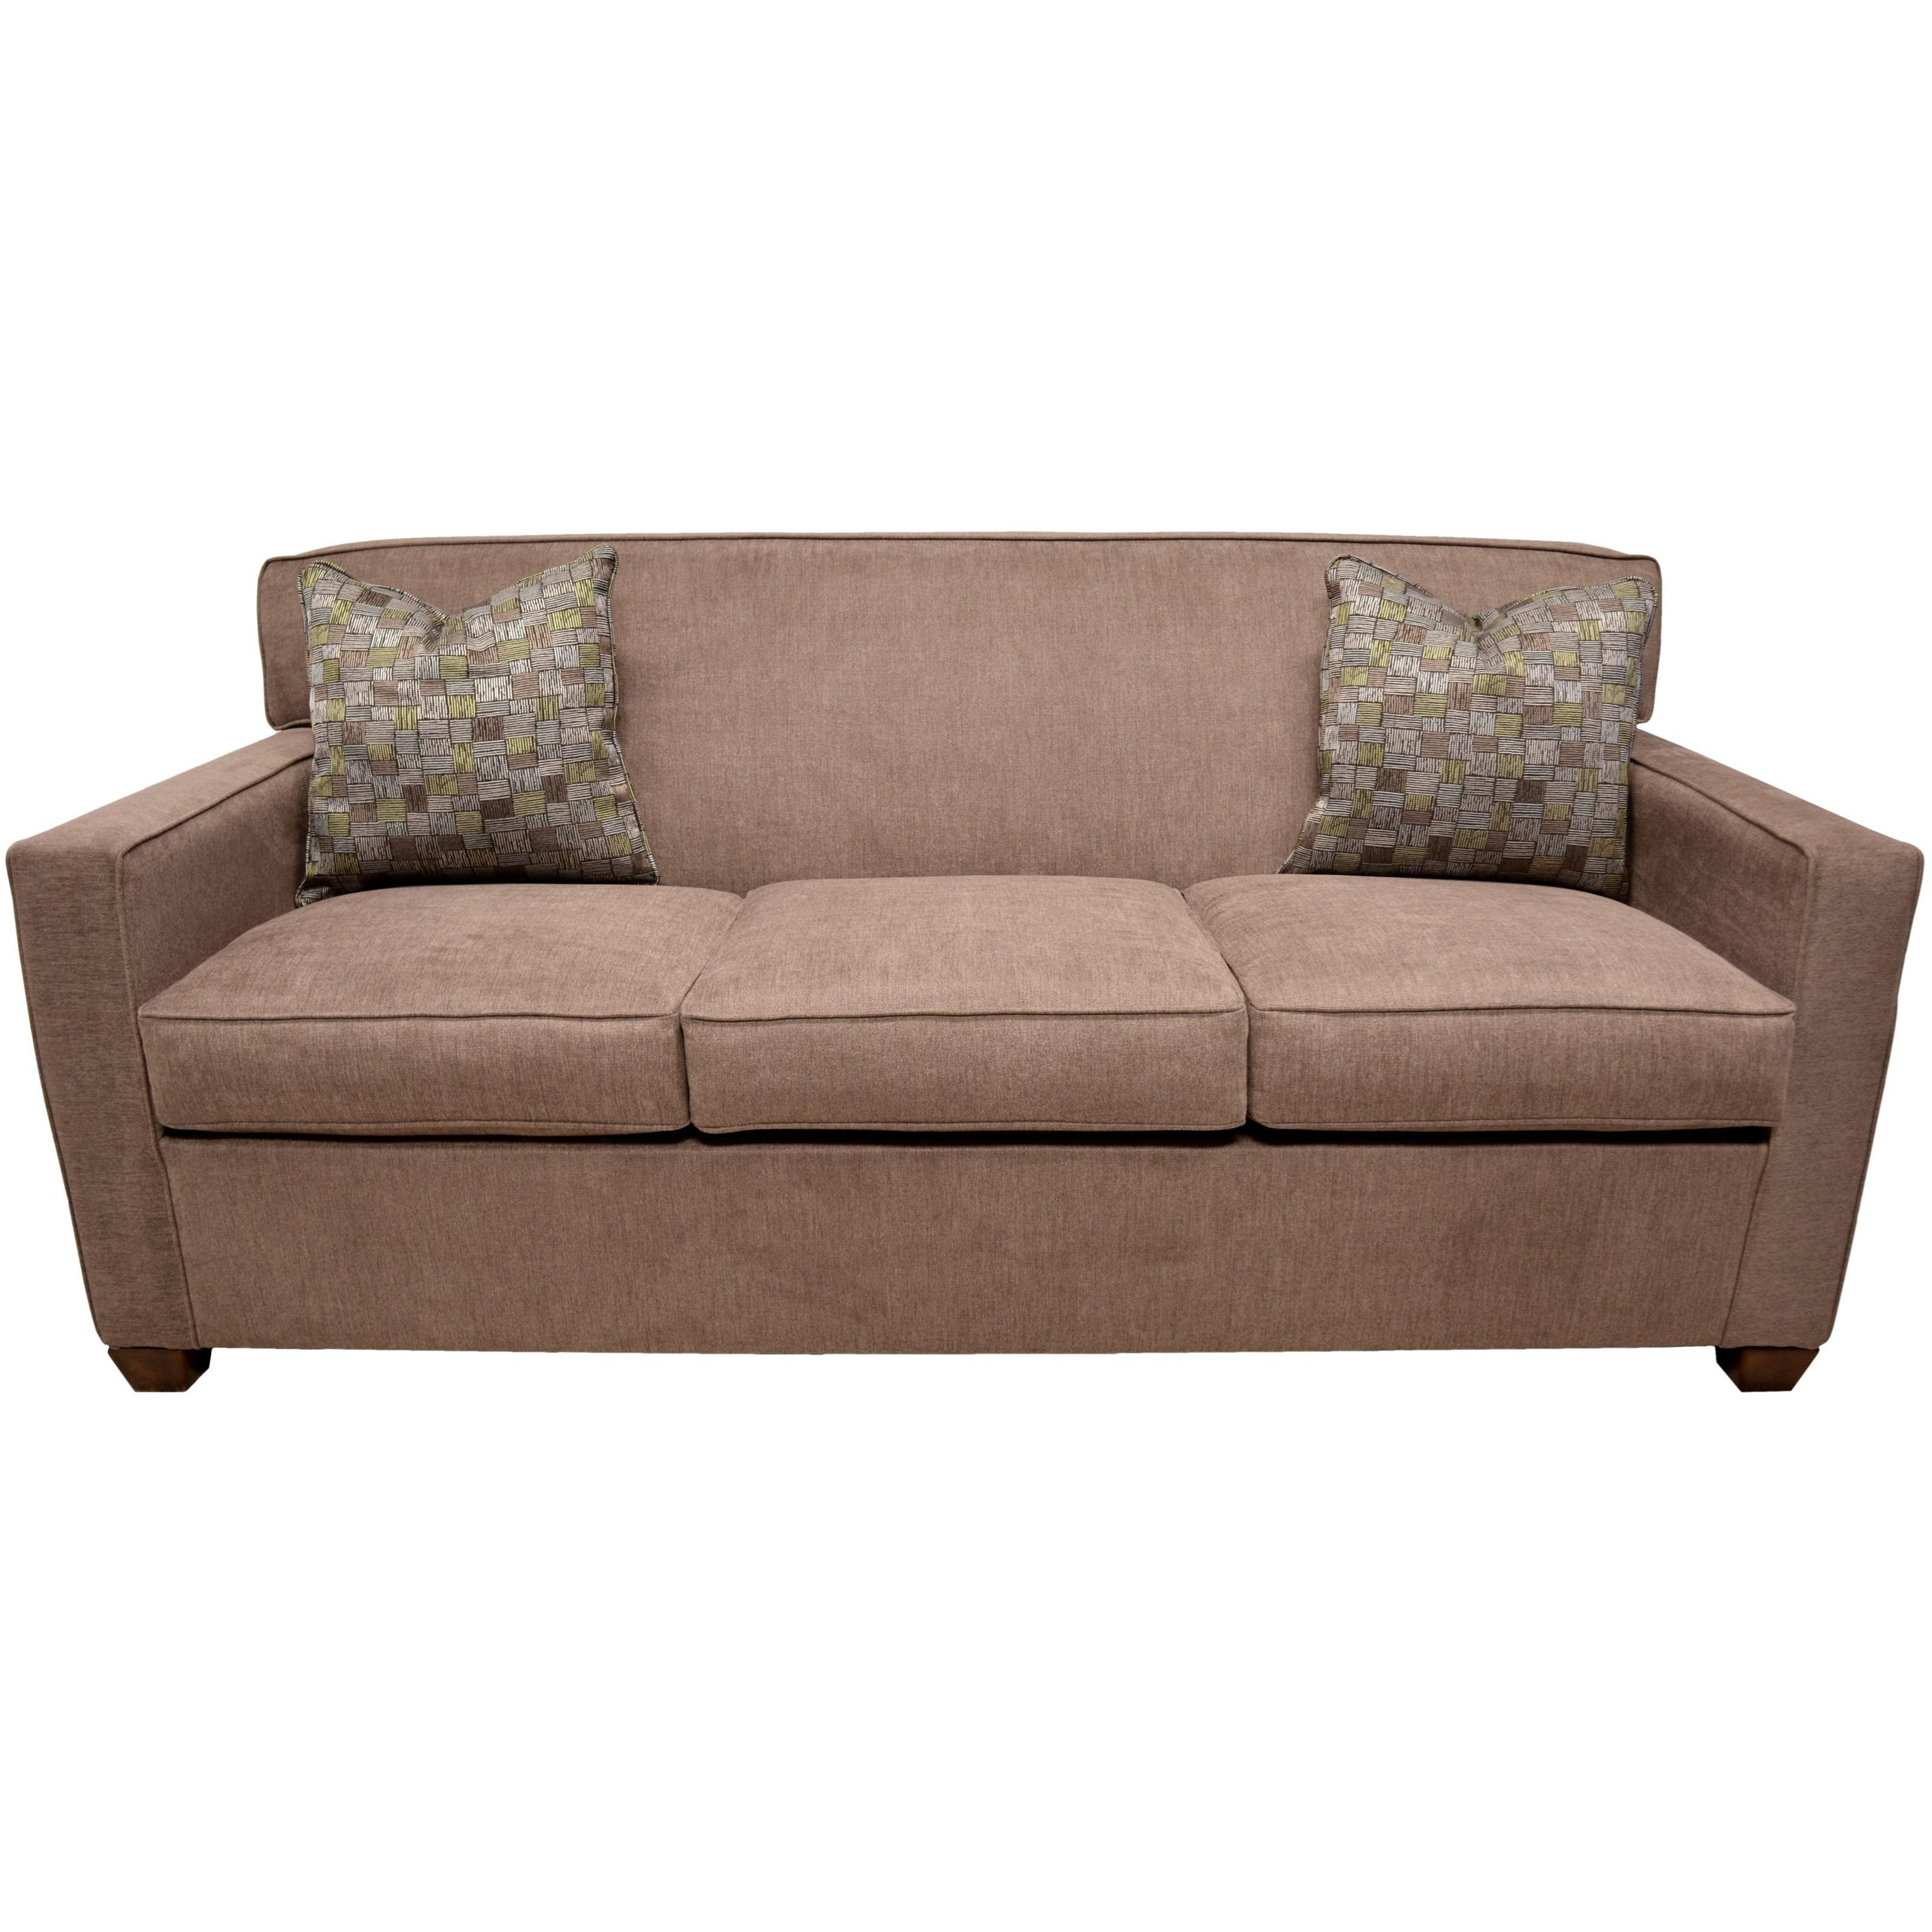 795 Queen Sleeper by LaCrosse at Mueller Furniture